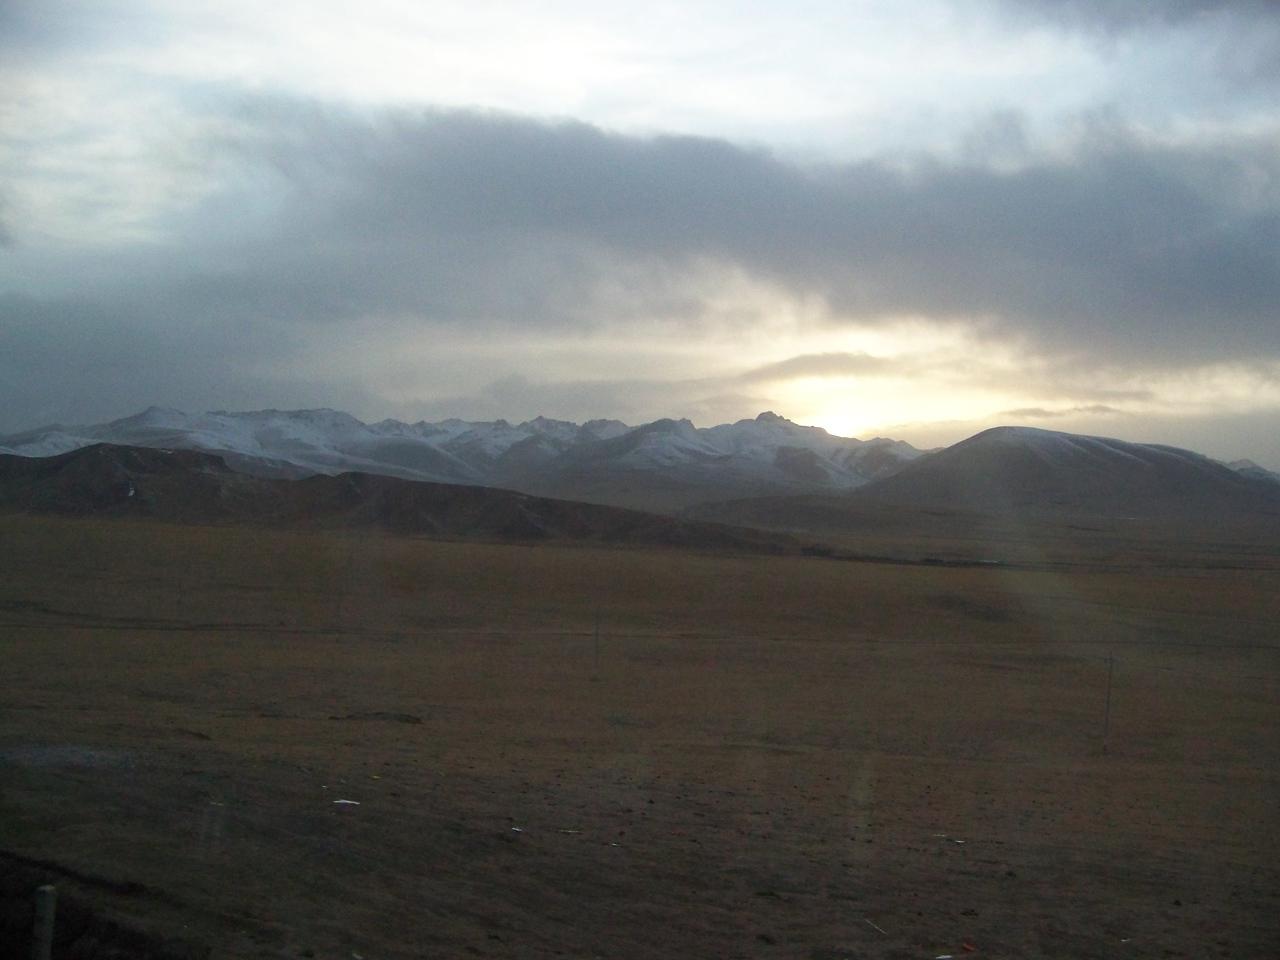 0092 - Scenery on Train Trip Between Beijing and Lhasa.JPG